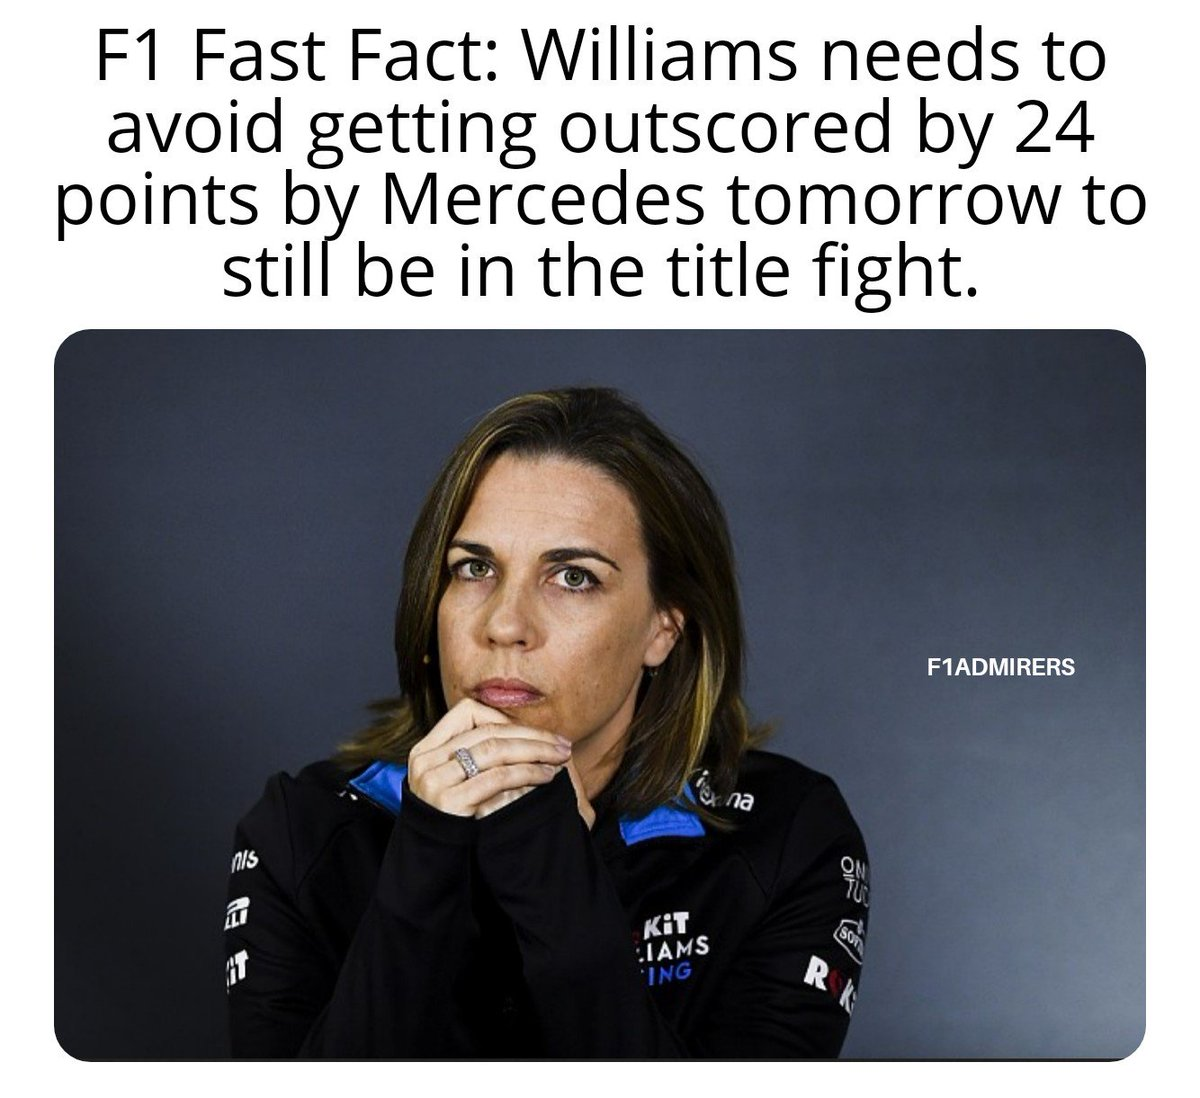 If there was ever a time for the sandbags to come off.. -- #F1FastFact #Vettel #Scuderia #Leclerc #CL16 #MaxVerstappen #HaasF1Team #RomainGrosjean #KevinMagnussen #Hulkenberg #DanielRicciardo #KimiRaikkonen #DaniilKvyat #RacingPoint #SergioPerez #F1Game #F1Jokes #F1 #FormulaUno https://t.co/REgRVAZRWp